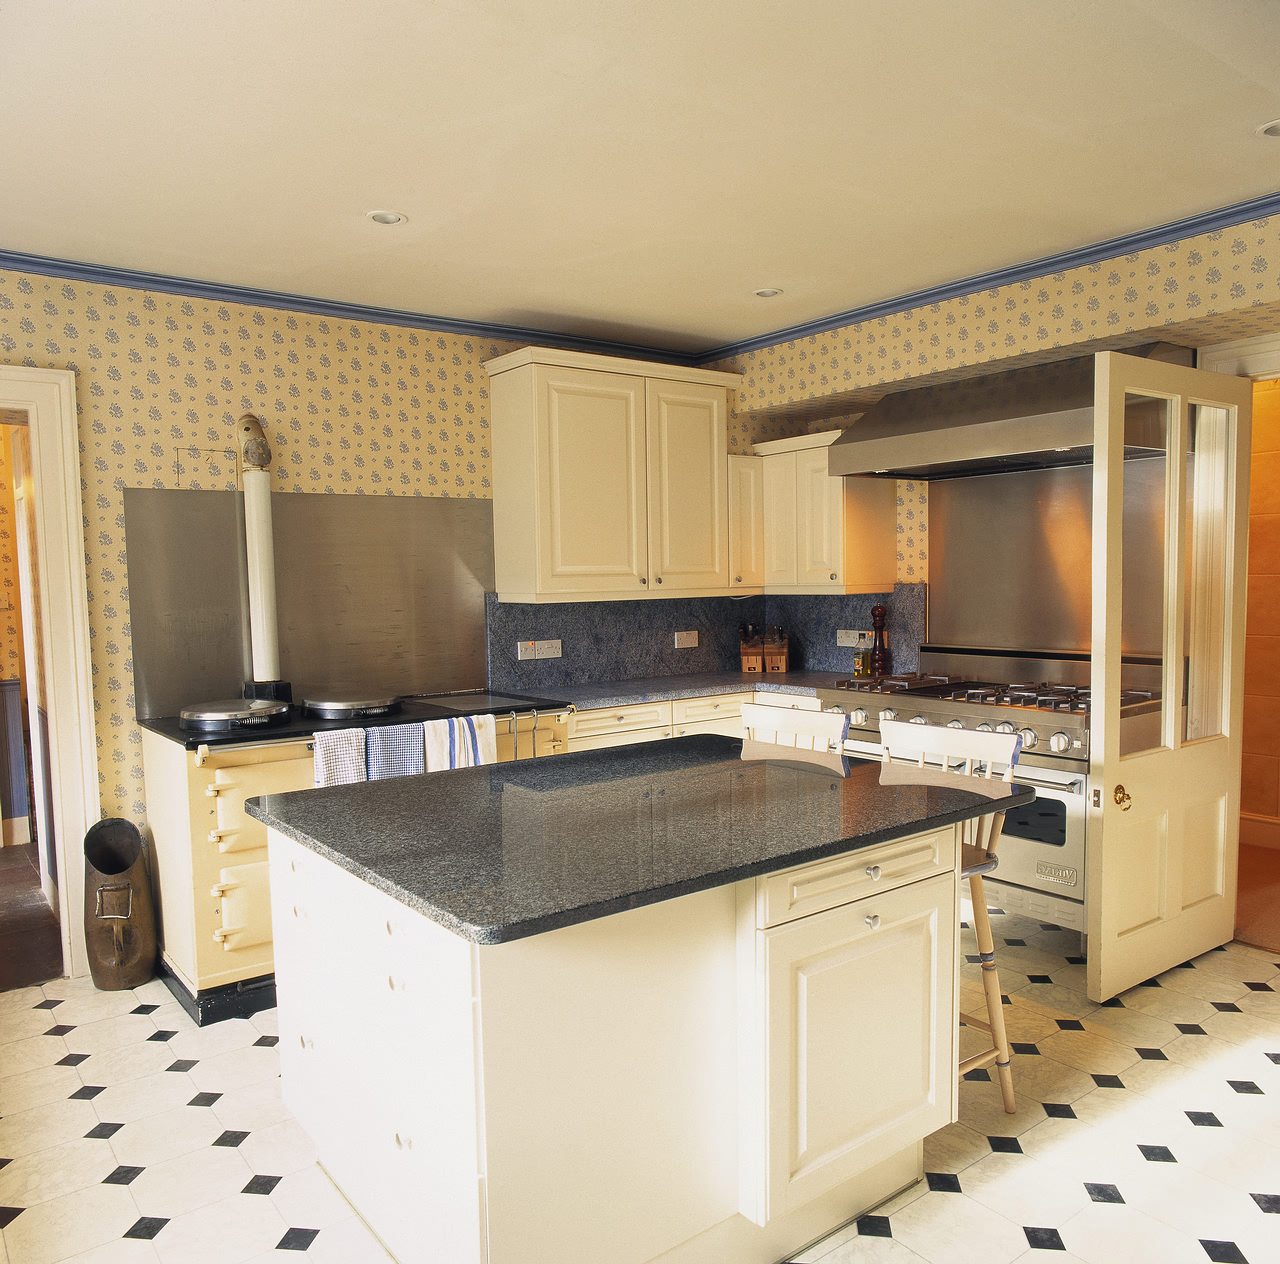 Modren black and white kitchen vinyl flooring floors before after black and white kitchen vinyl flooring best black and white tile kitchen floor ideas home dailygadgetfo Images